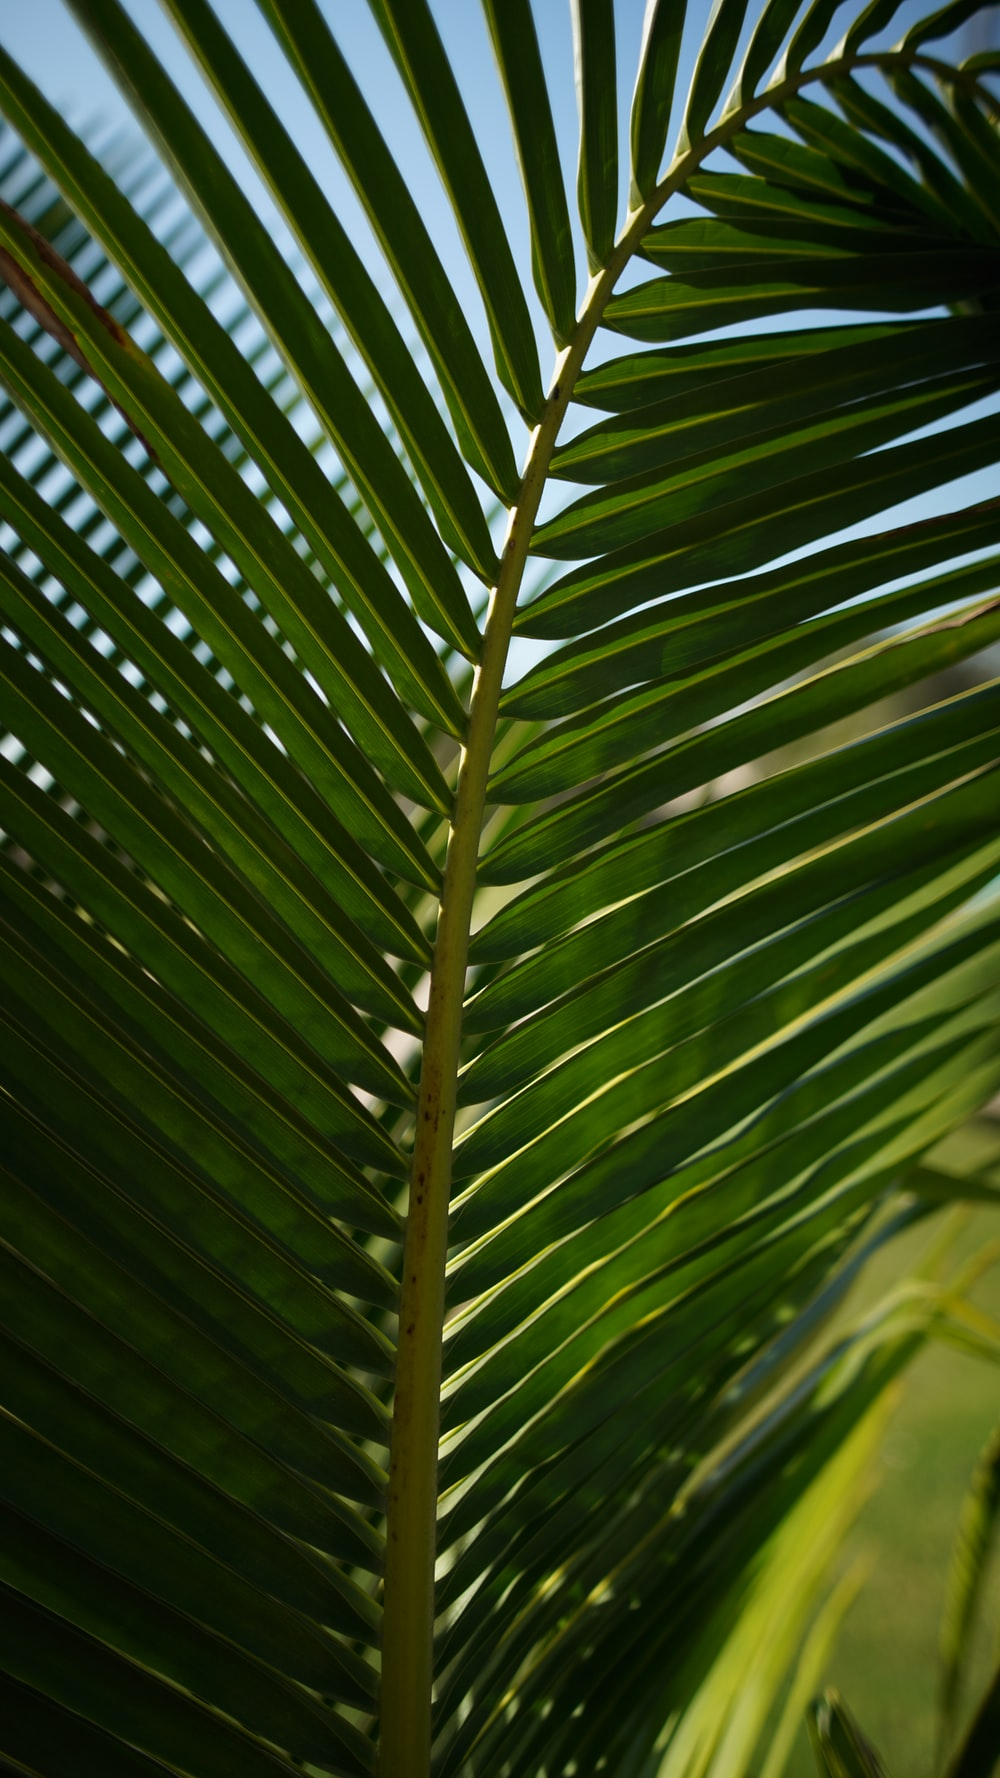 green palm leaf during daytime